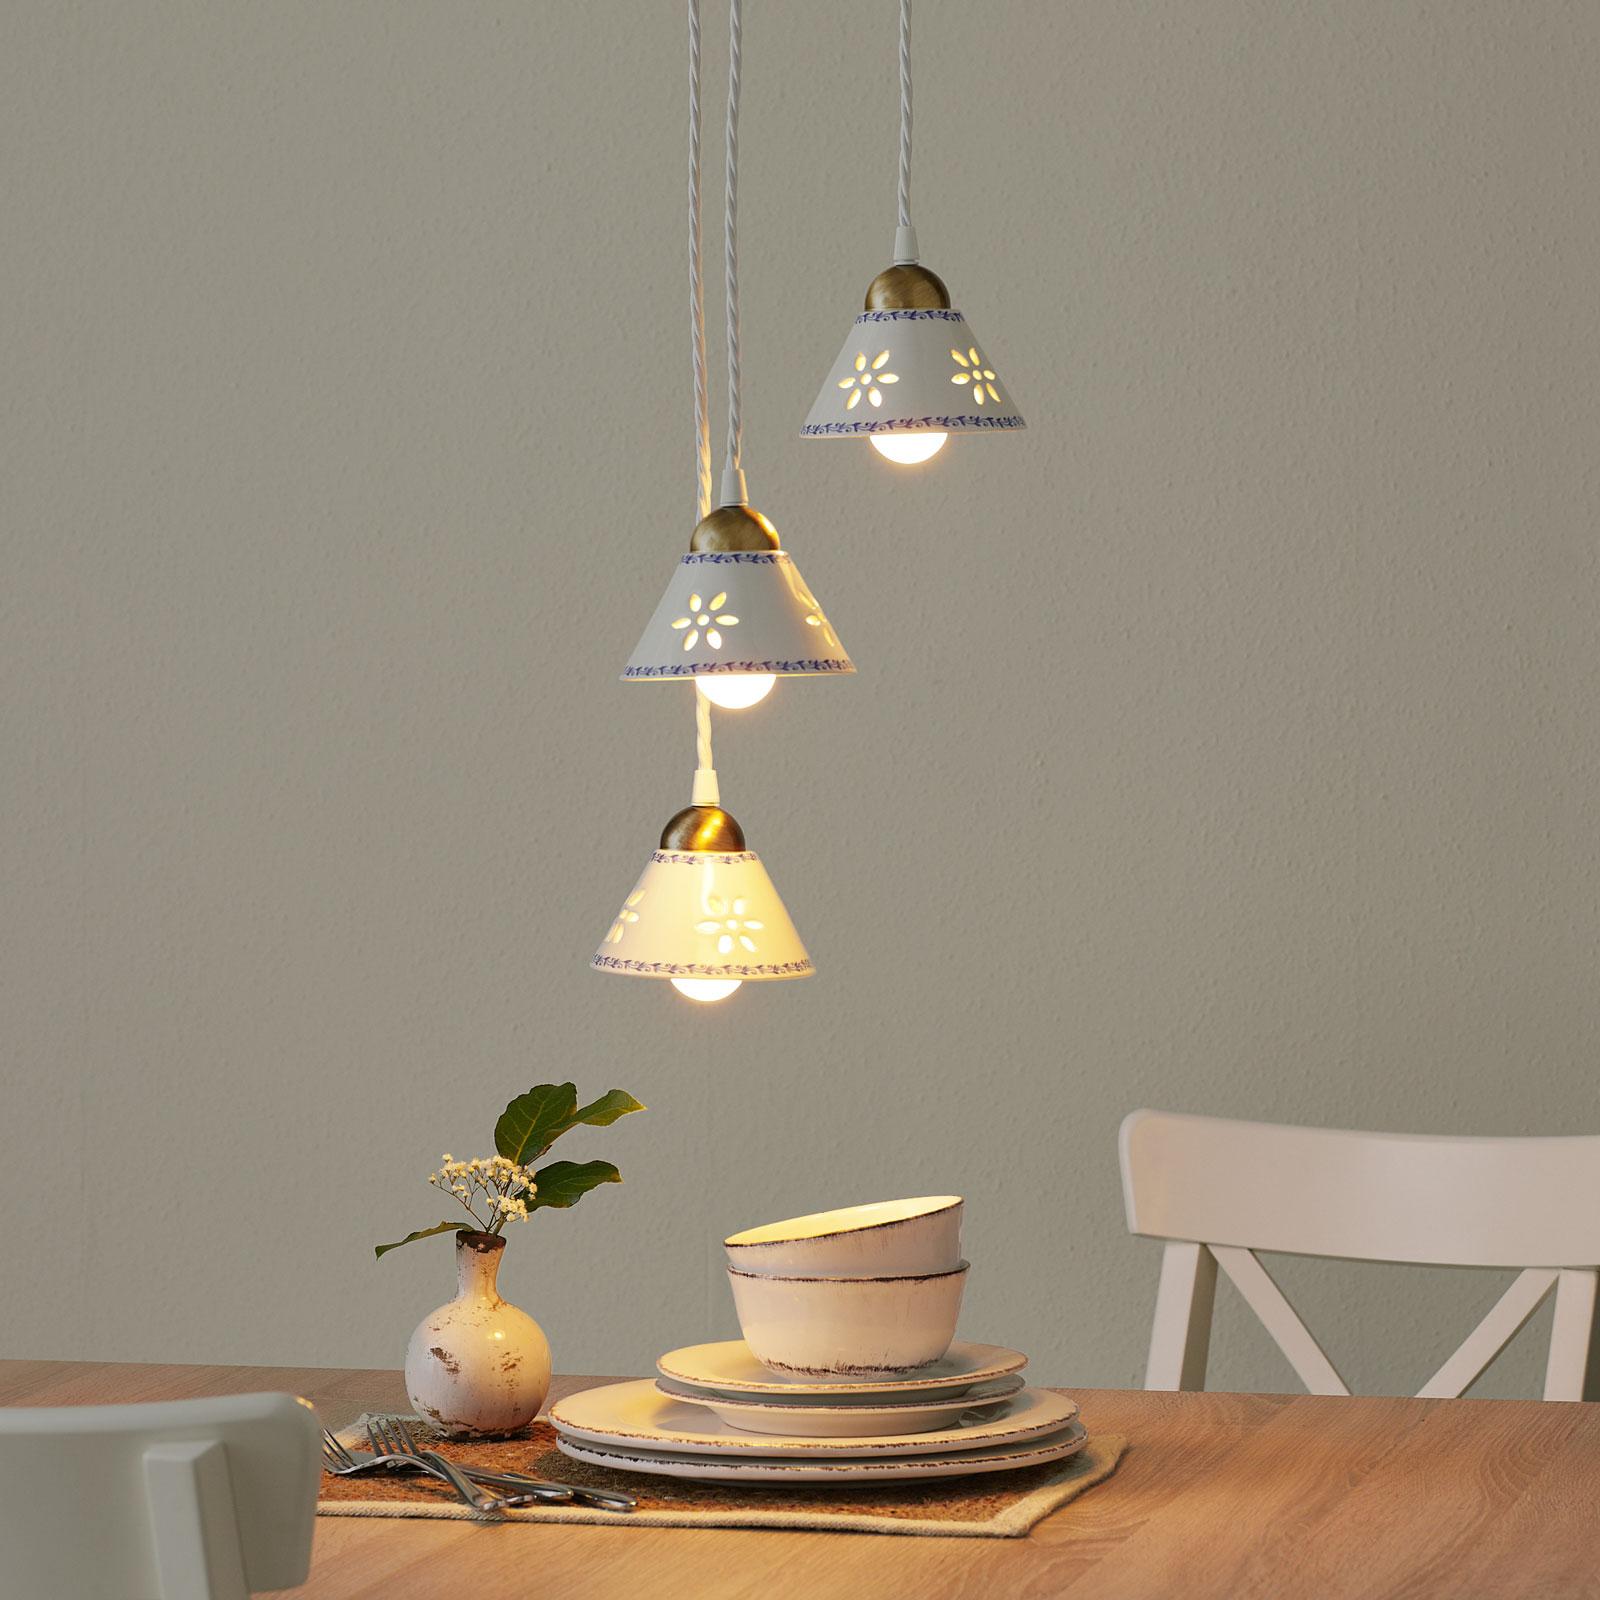 3-bulb NONNA hanging light, made of white ceramic_2013028_1